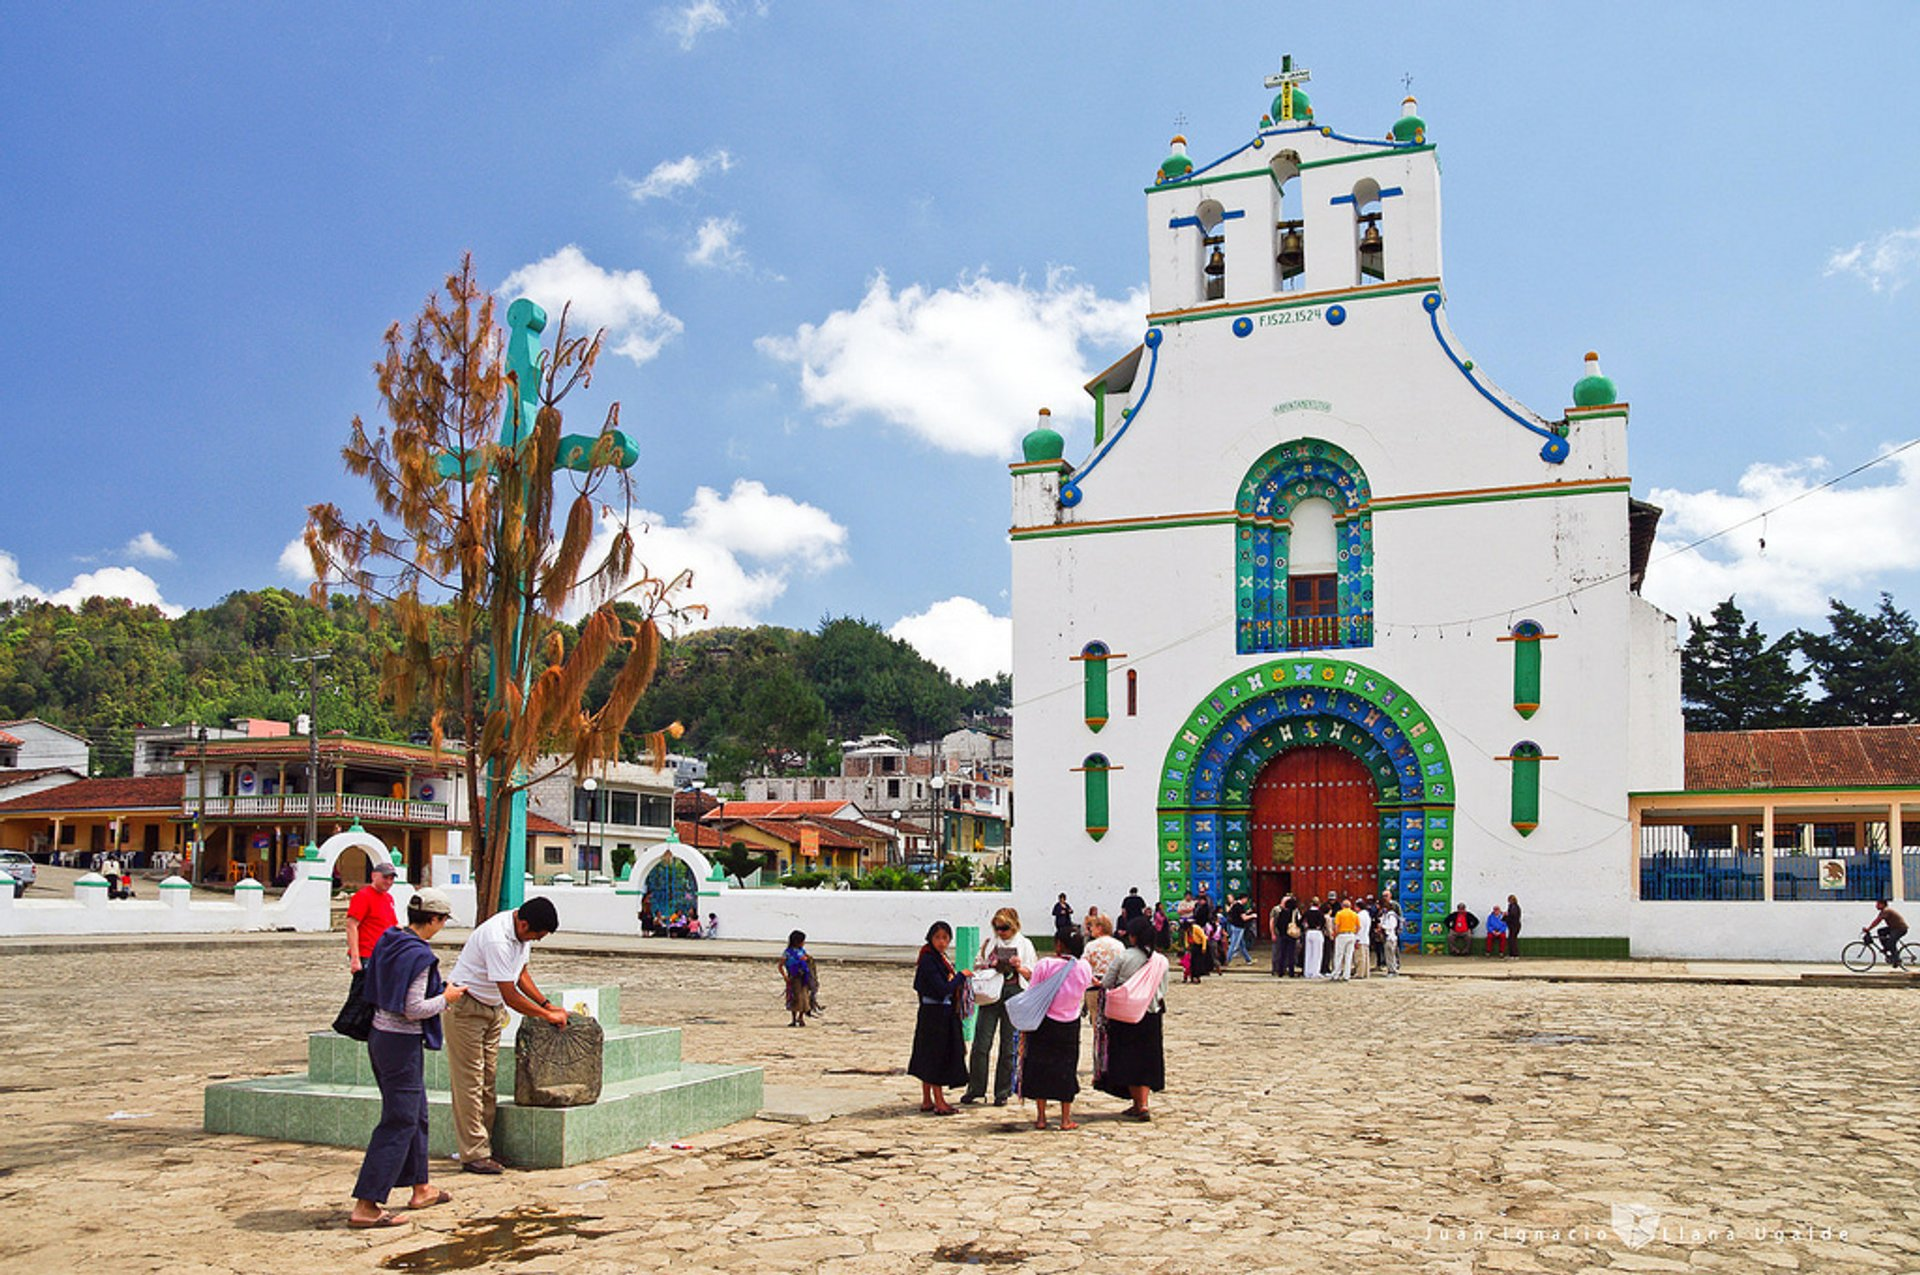 Iglesia de San Juan in Mexico 2020 - Best Time